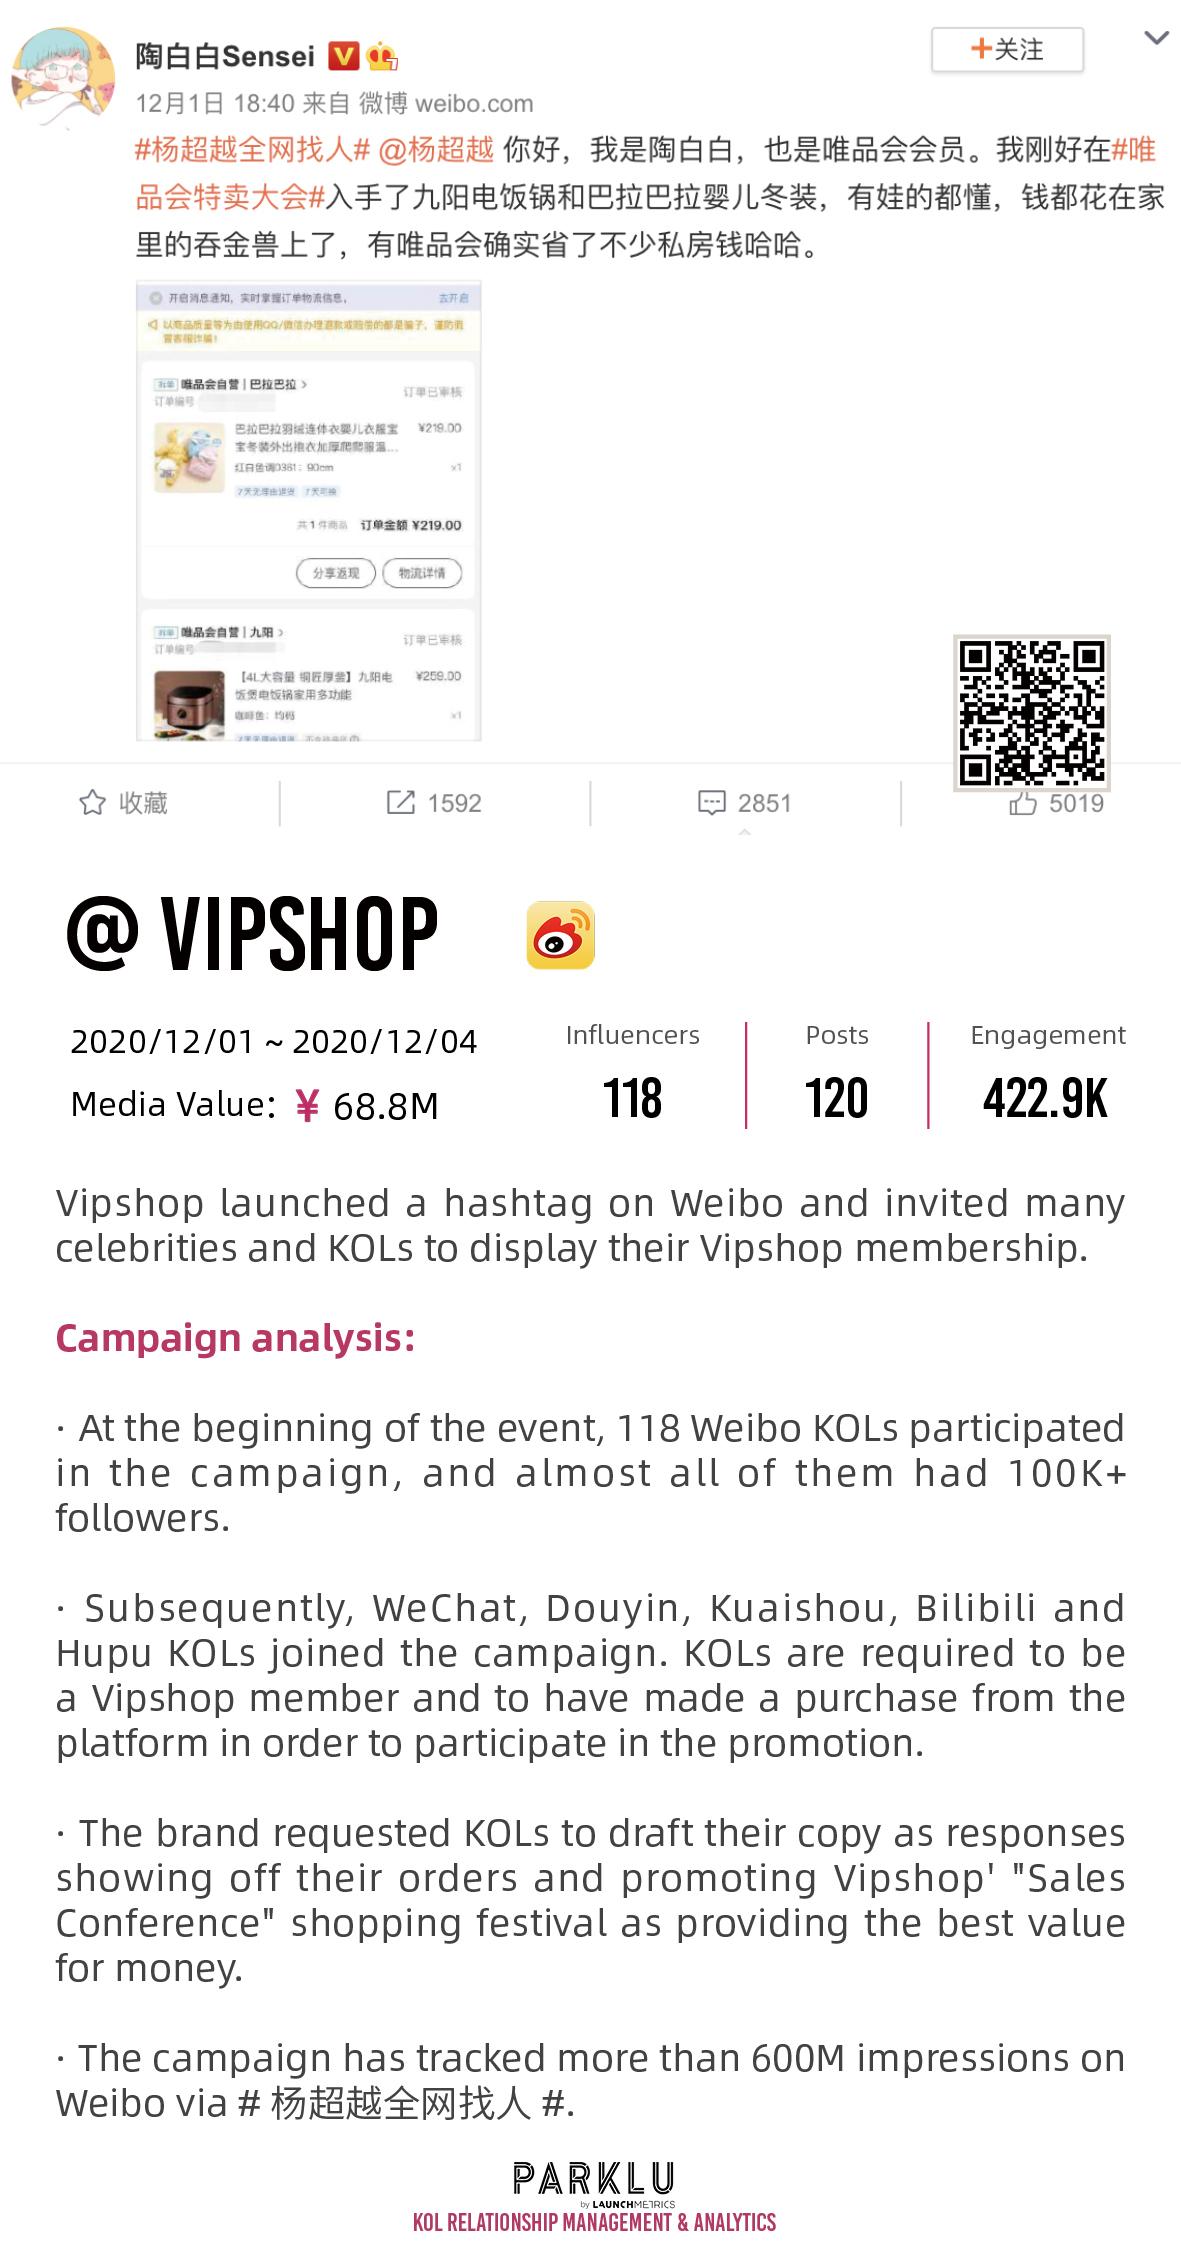 Vipshop Searching for Hidden Members